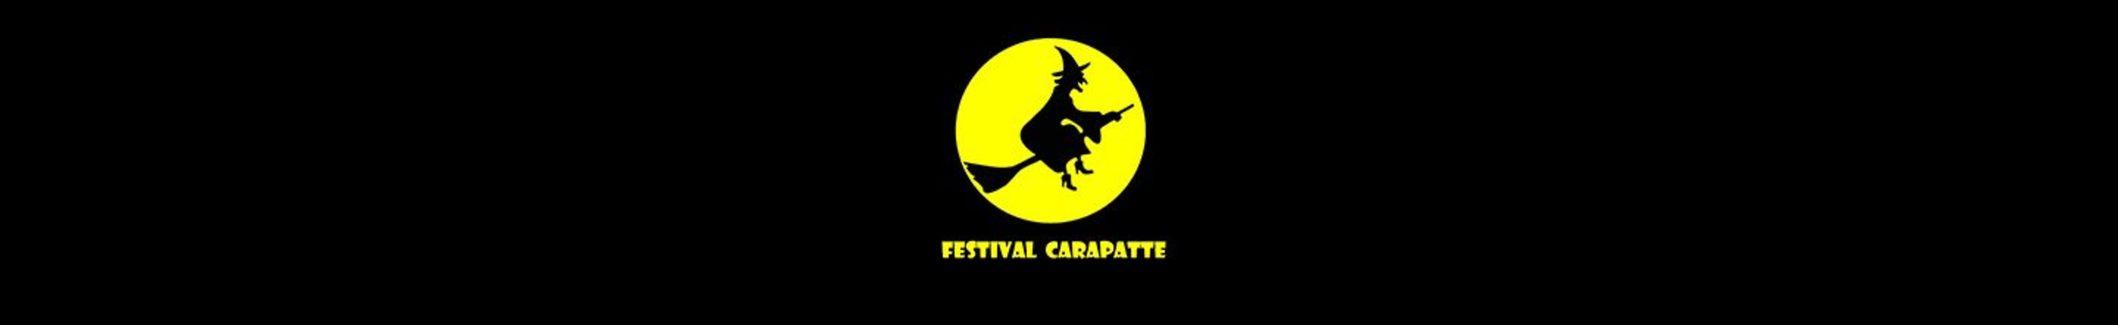 Festival Carapatte